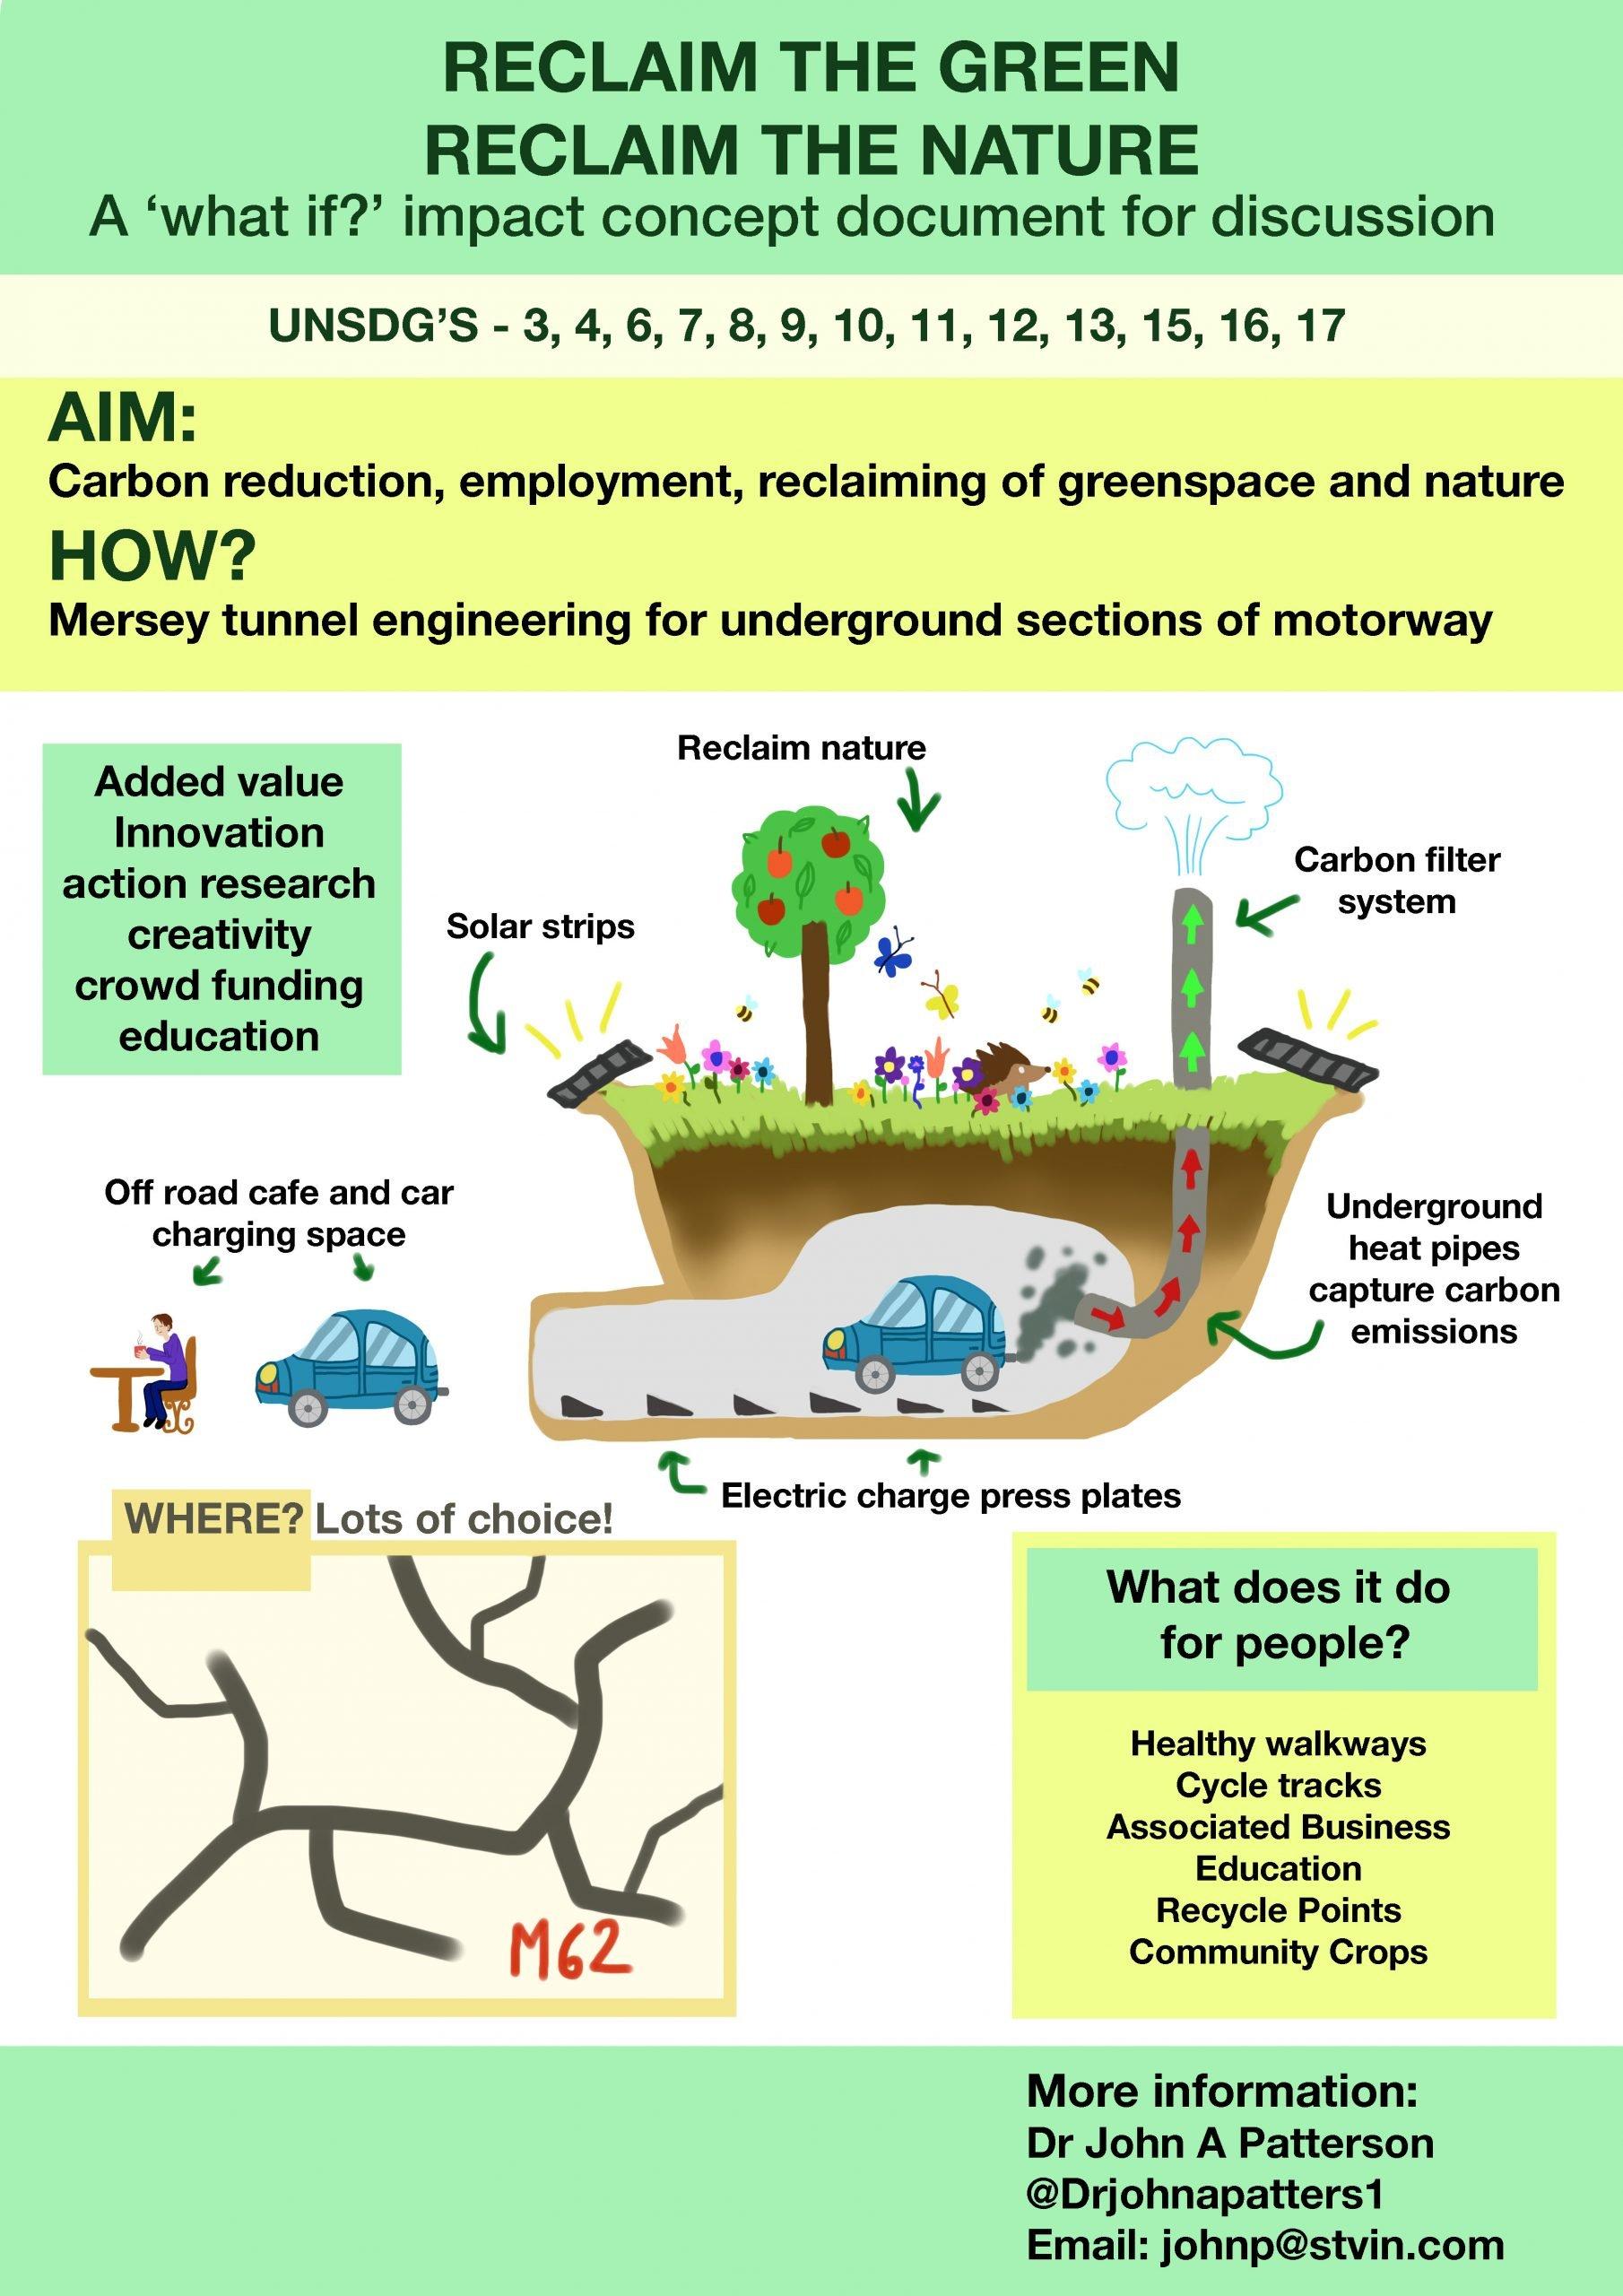 Reclaim the green reclaim the nature